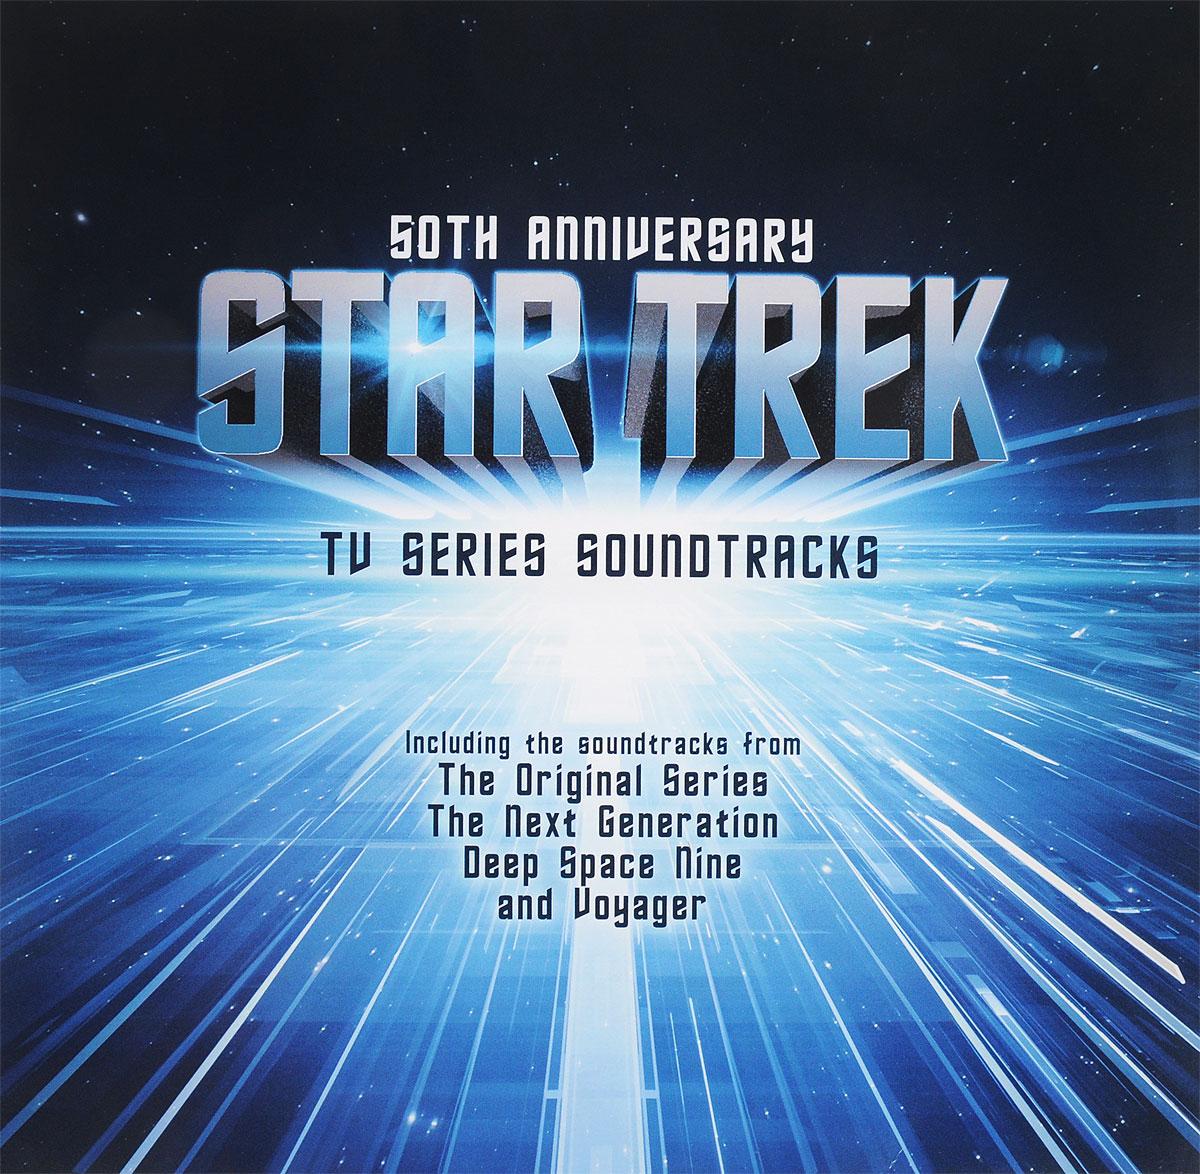 50th Anniversary Star Trek. TV Series Soundtracks (2 LP)